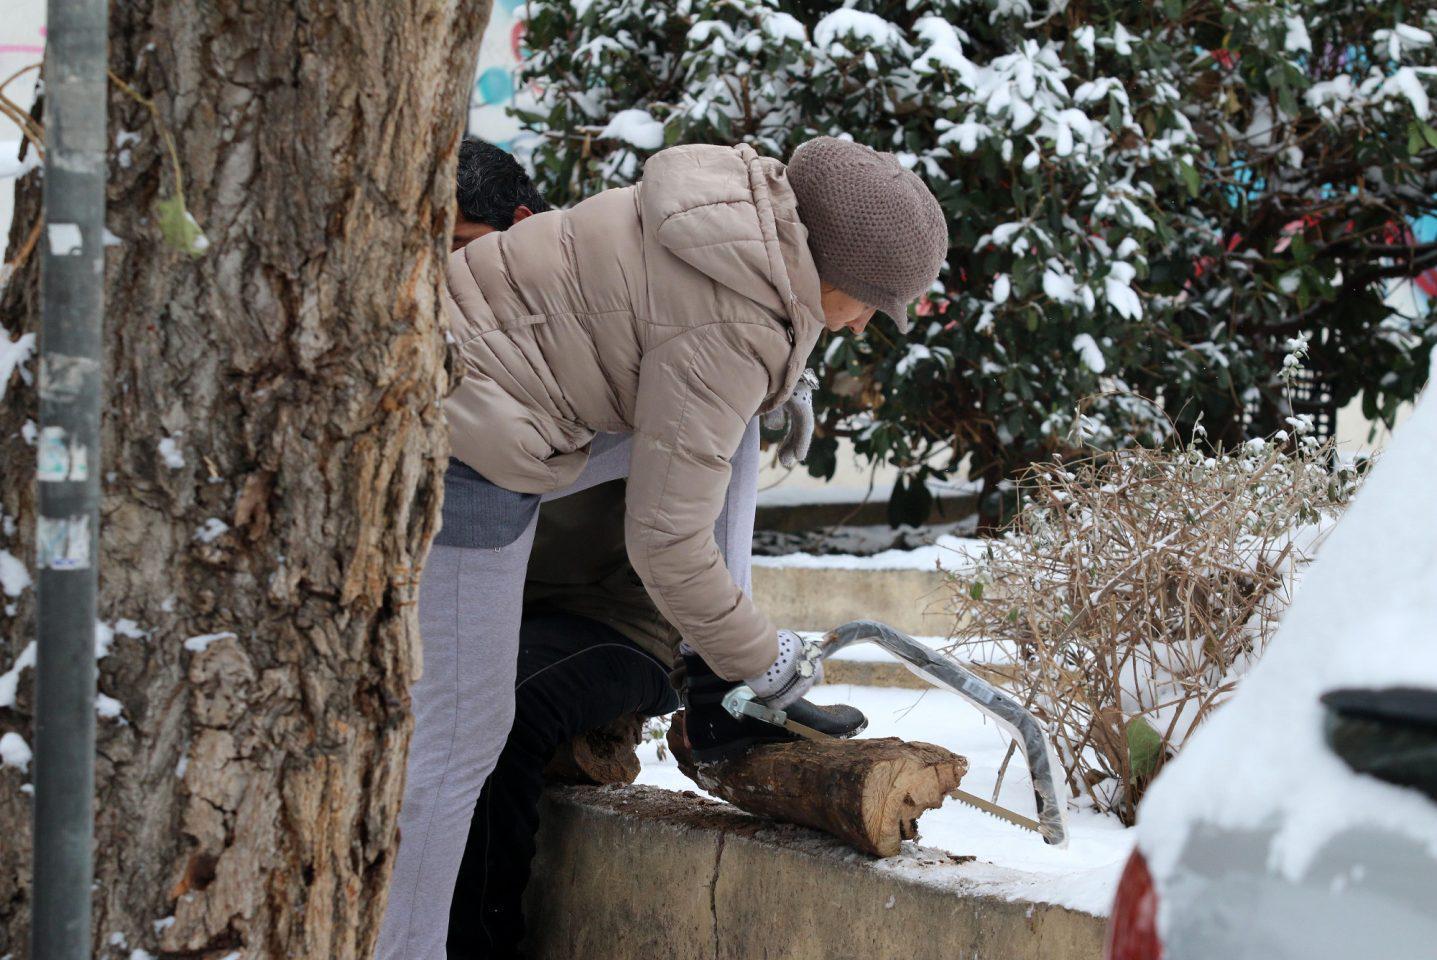 thessaloniki-xionia2-1300 Σε πόλη «φάντασμα» έχει μετατραπεί η Θεσσαλονίκη από το χιονιά – Χωρίς νερό και θέρμανση πολλές περιοχές